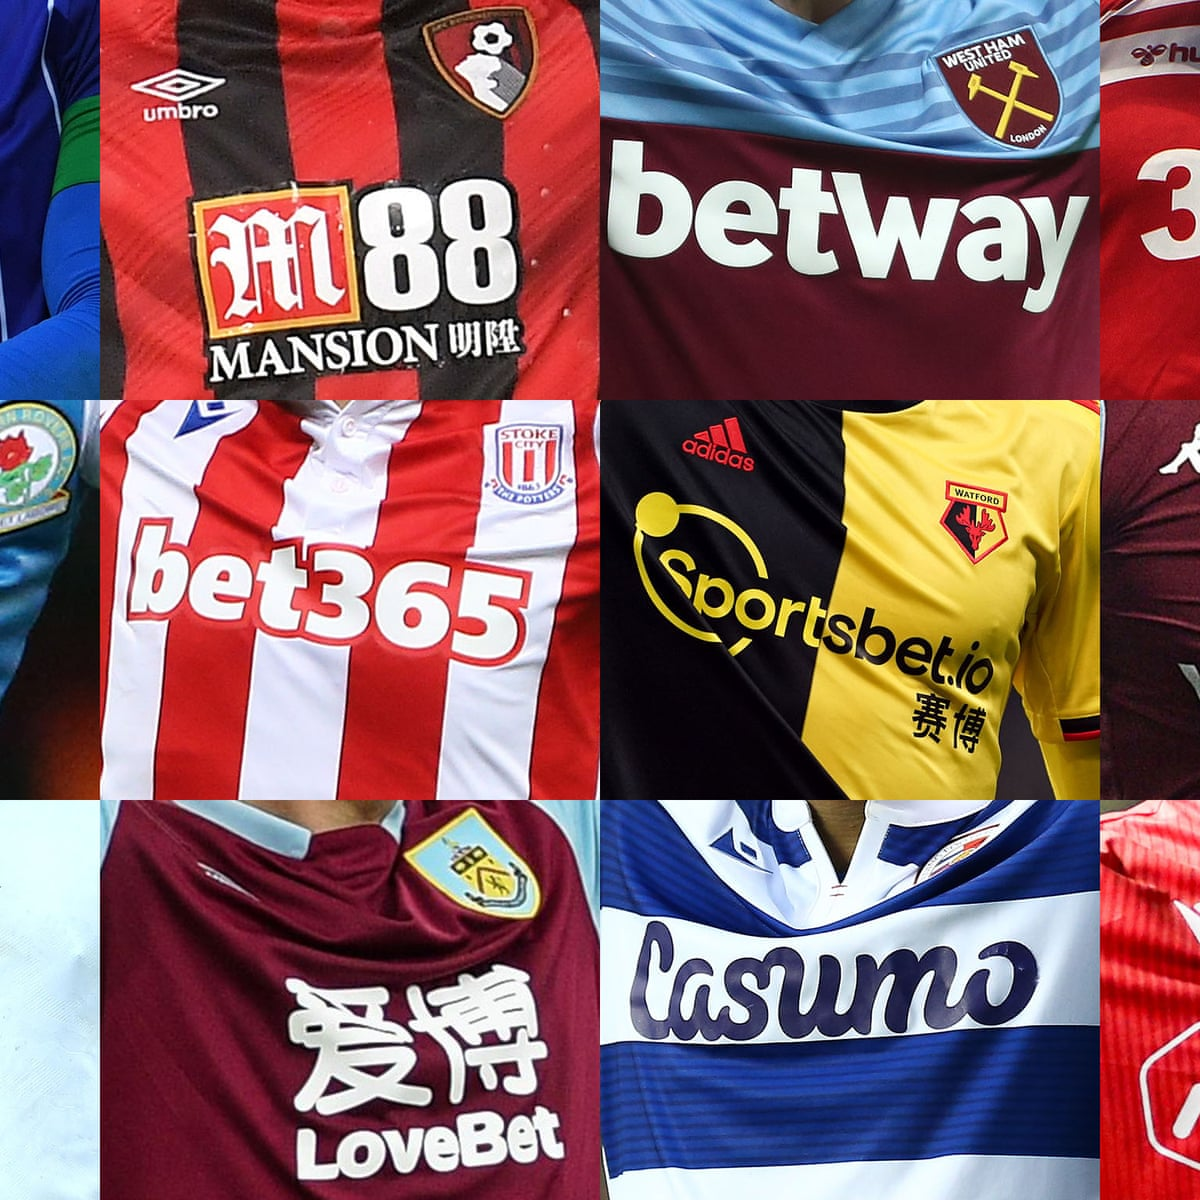 Football betting companies far cry 3 betting against the house